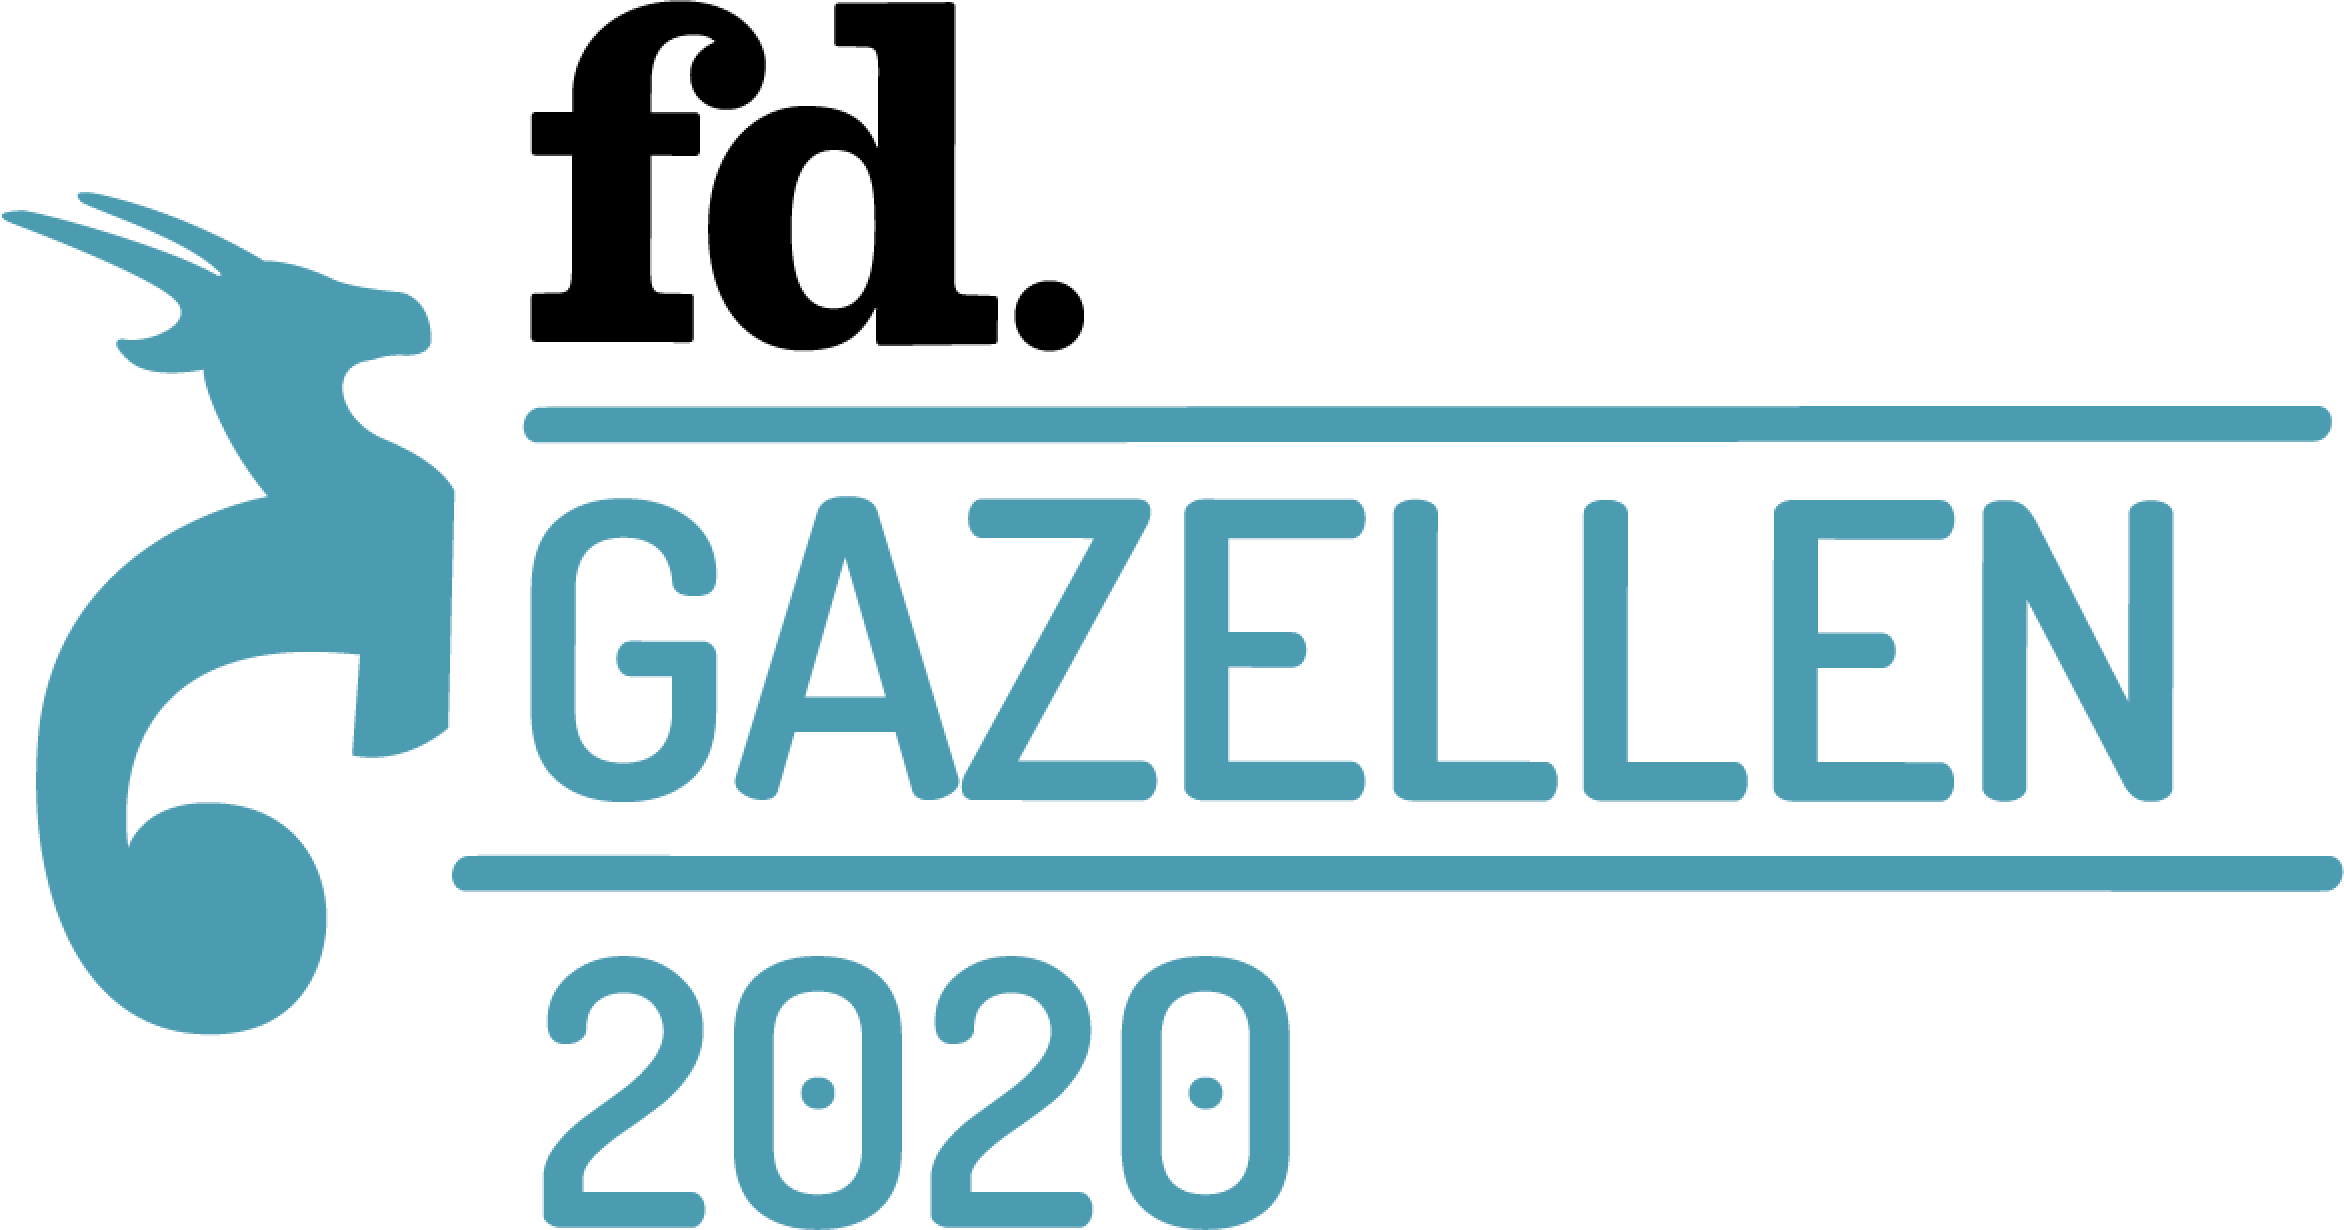 FD gazelle award 2020